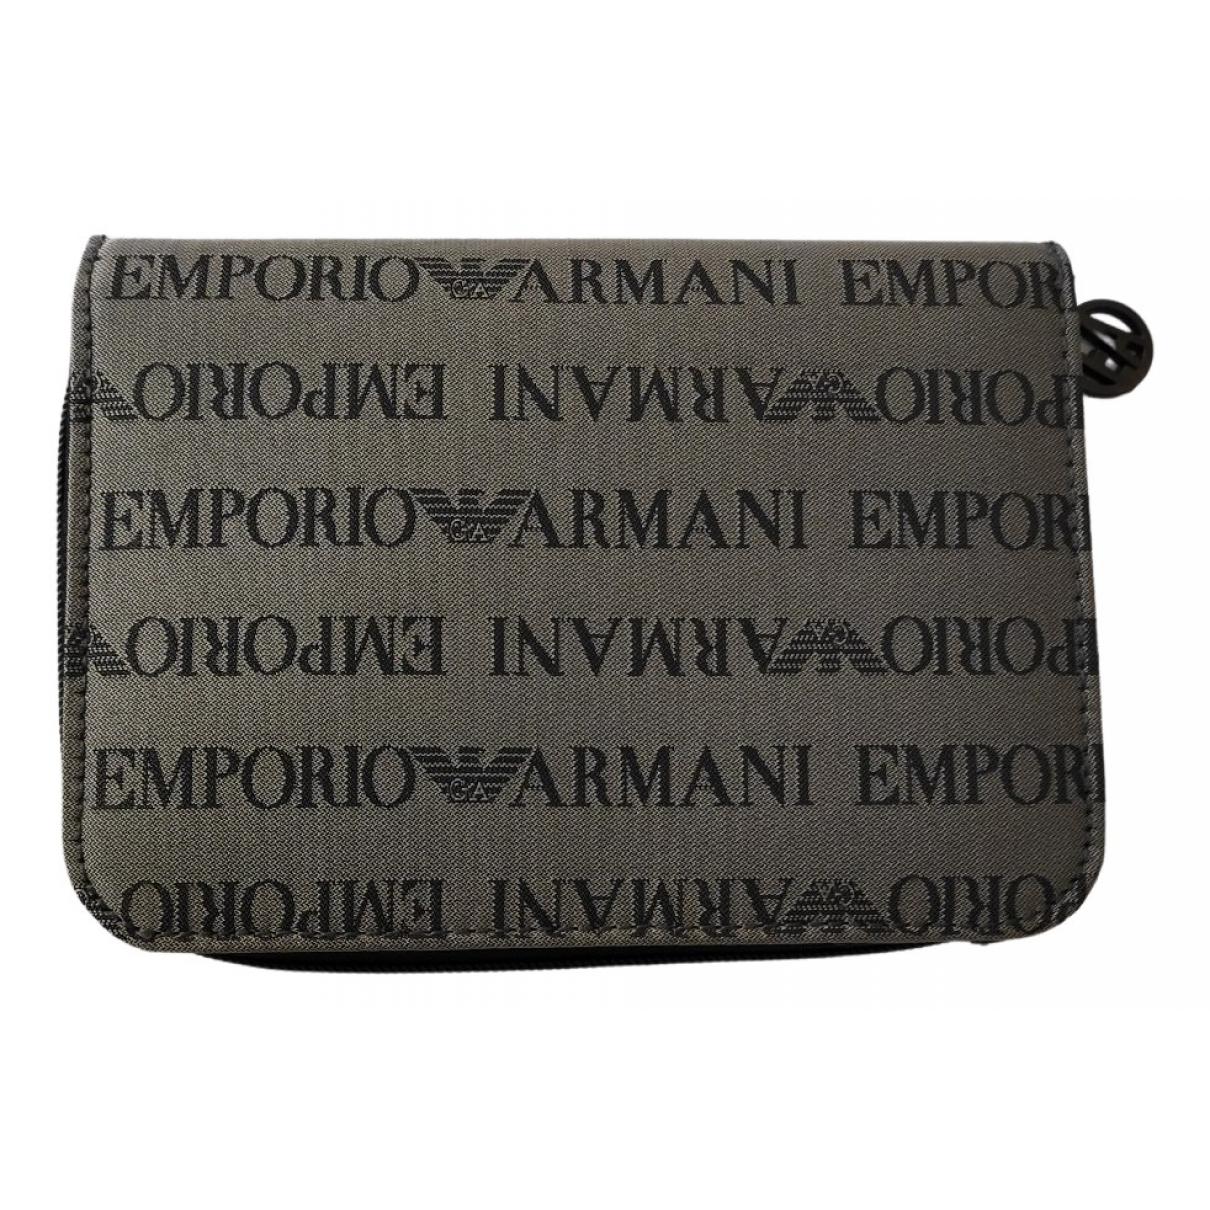 Emporio Armani \N Portemonnaie in  Grau Leinen